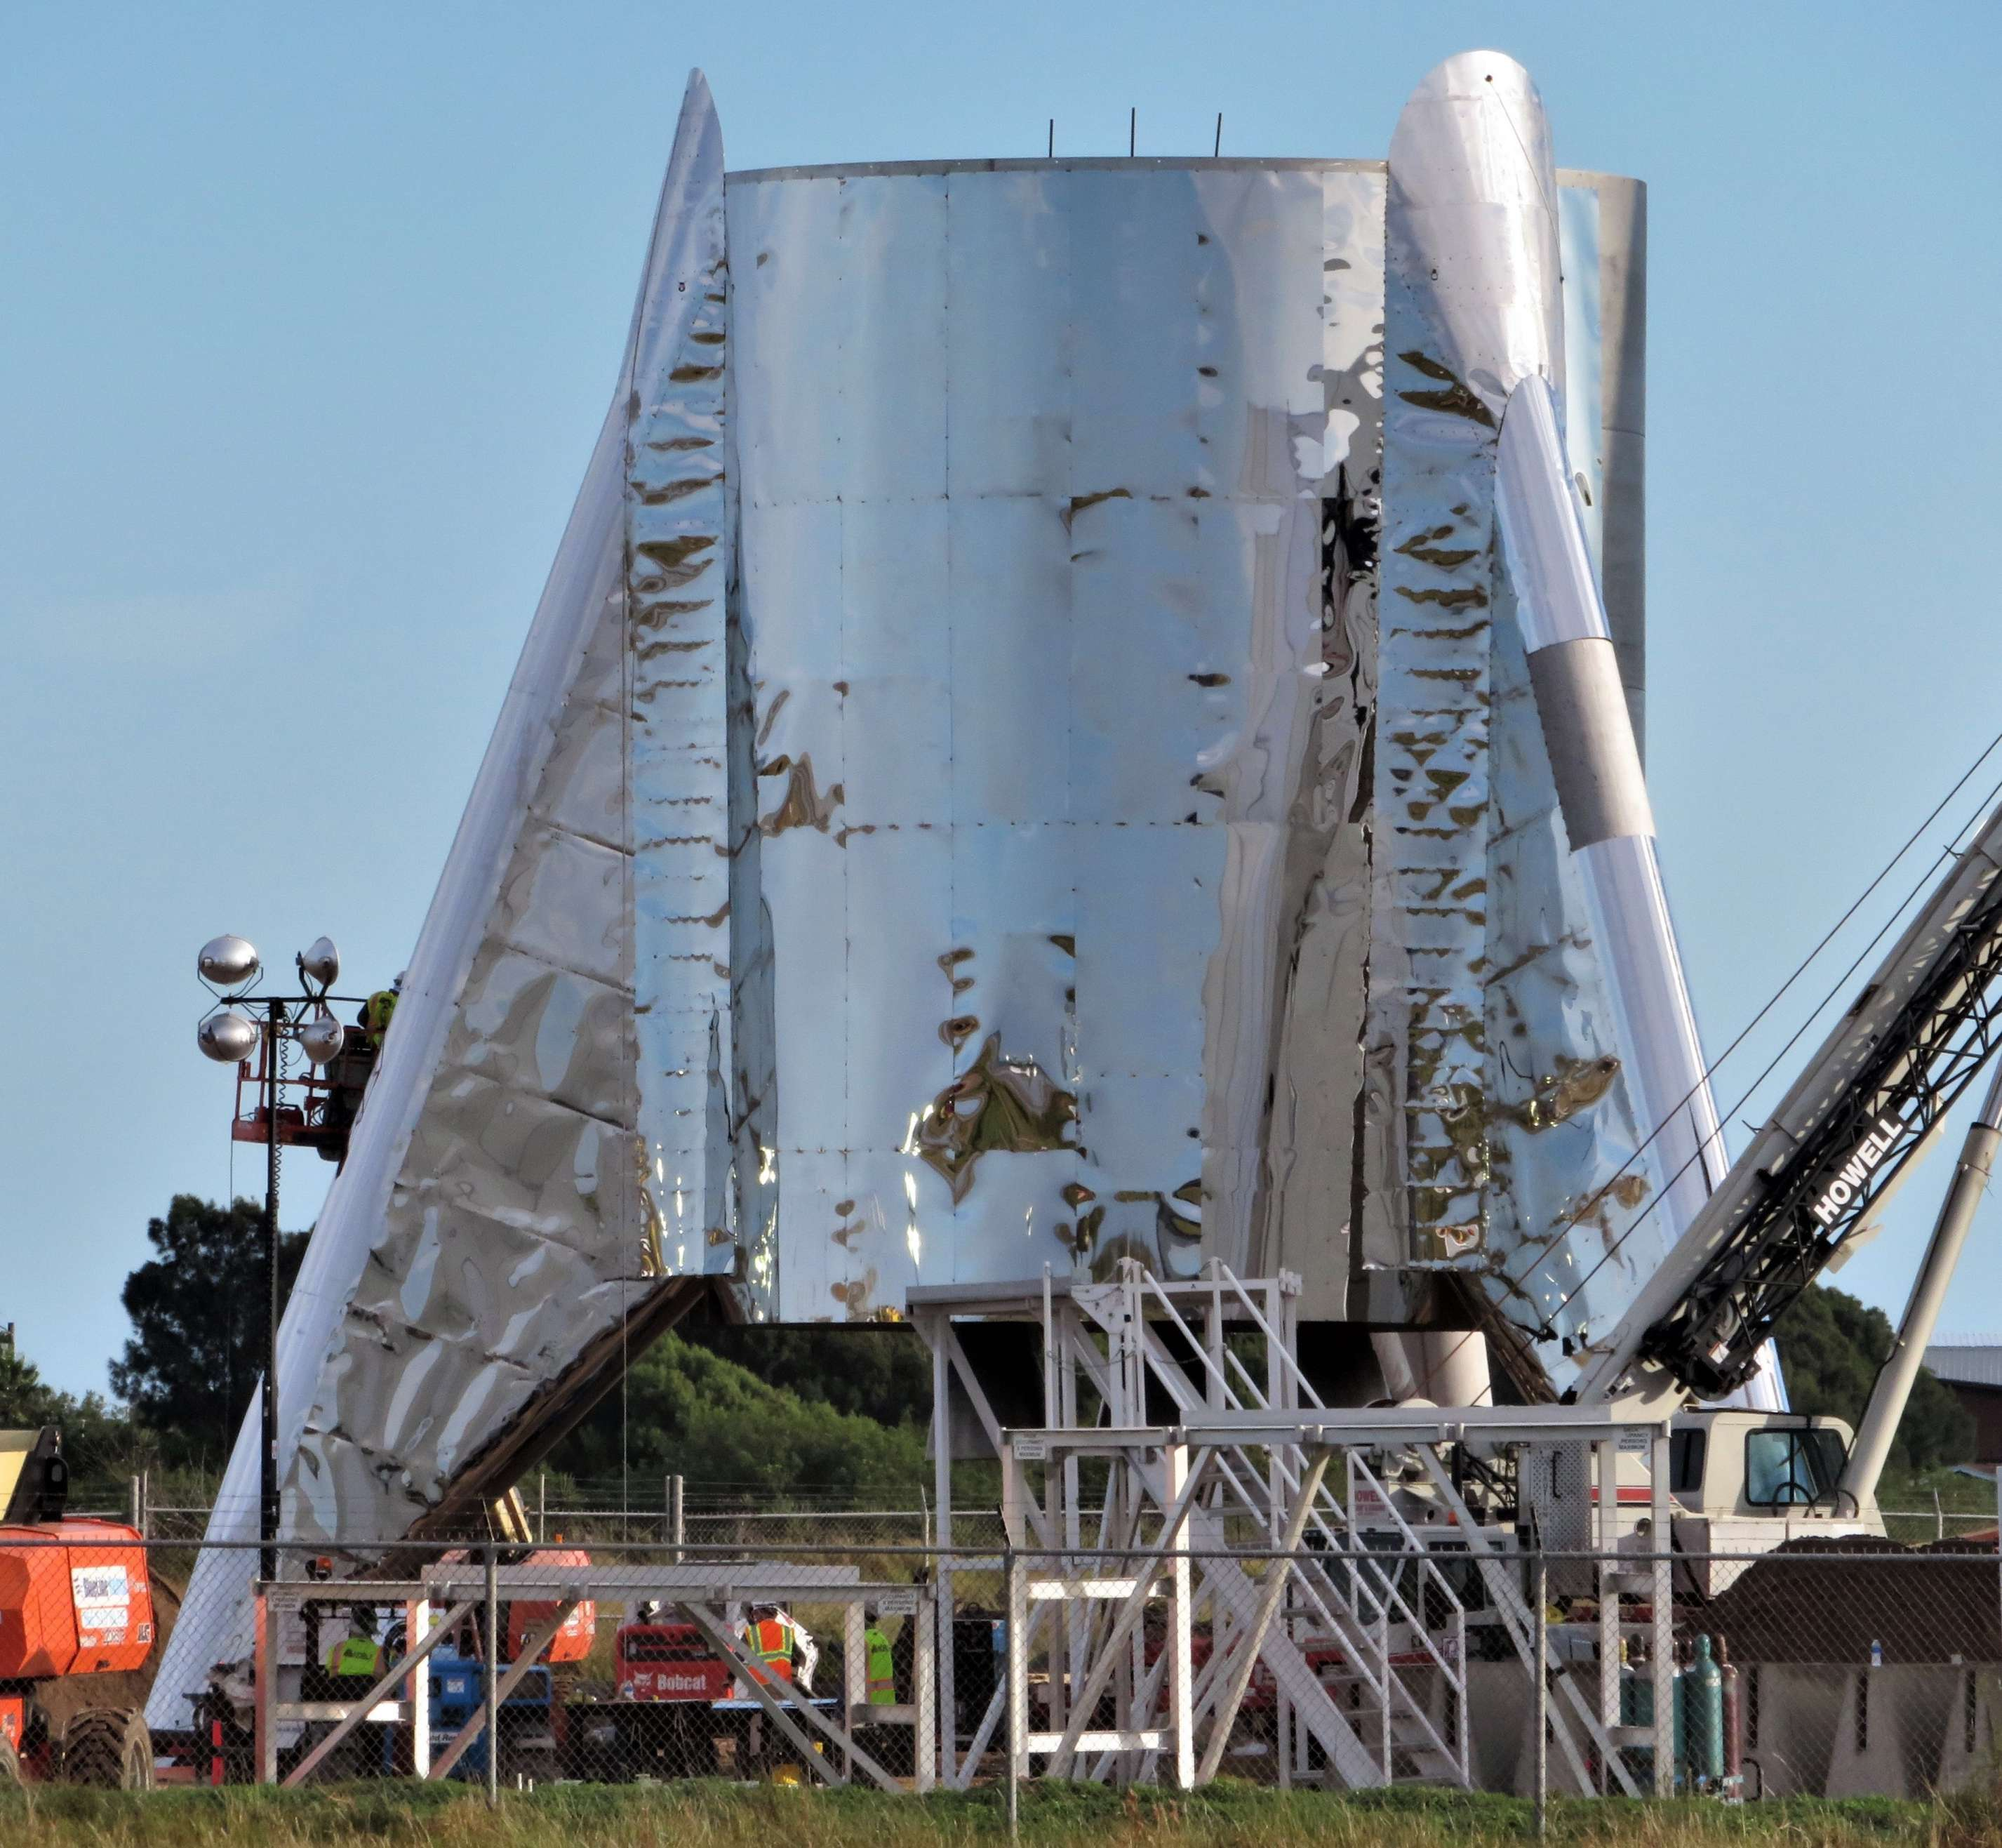 Boca Chica Starship Alpha progress 010618 (NSF – bocachicagal) 2 square(c)